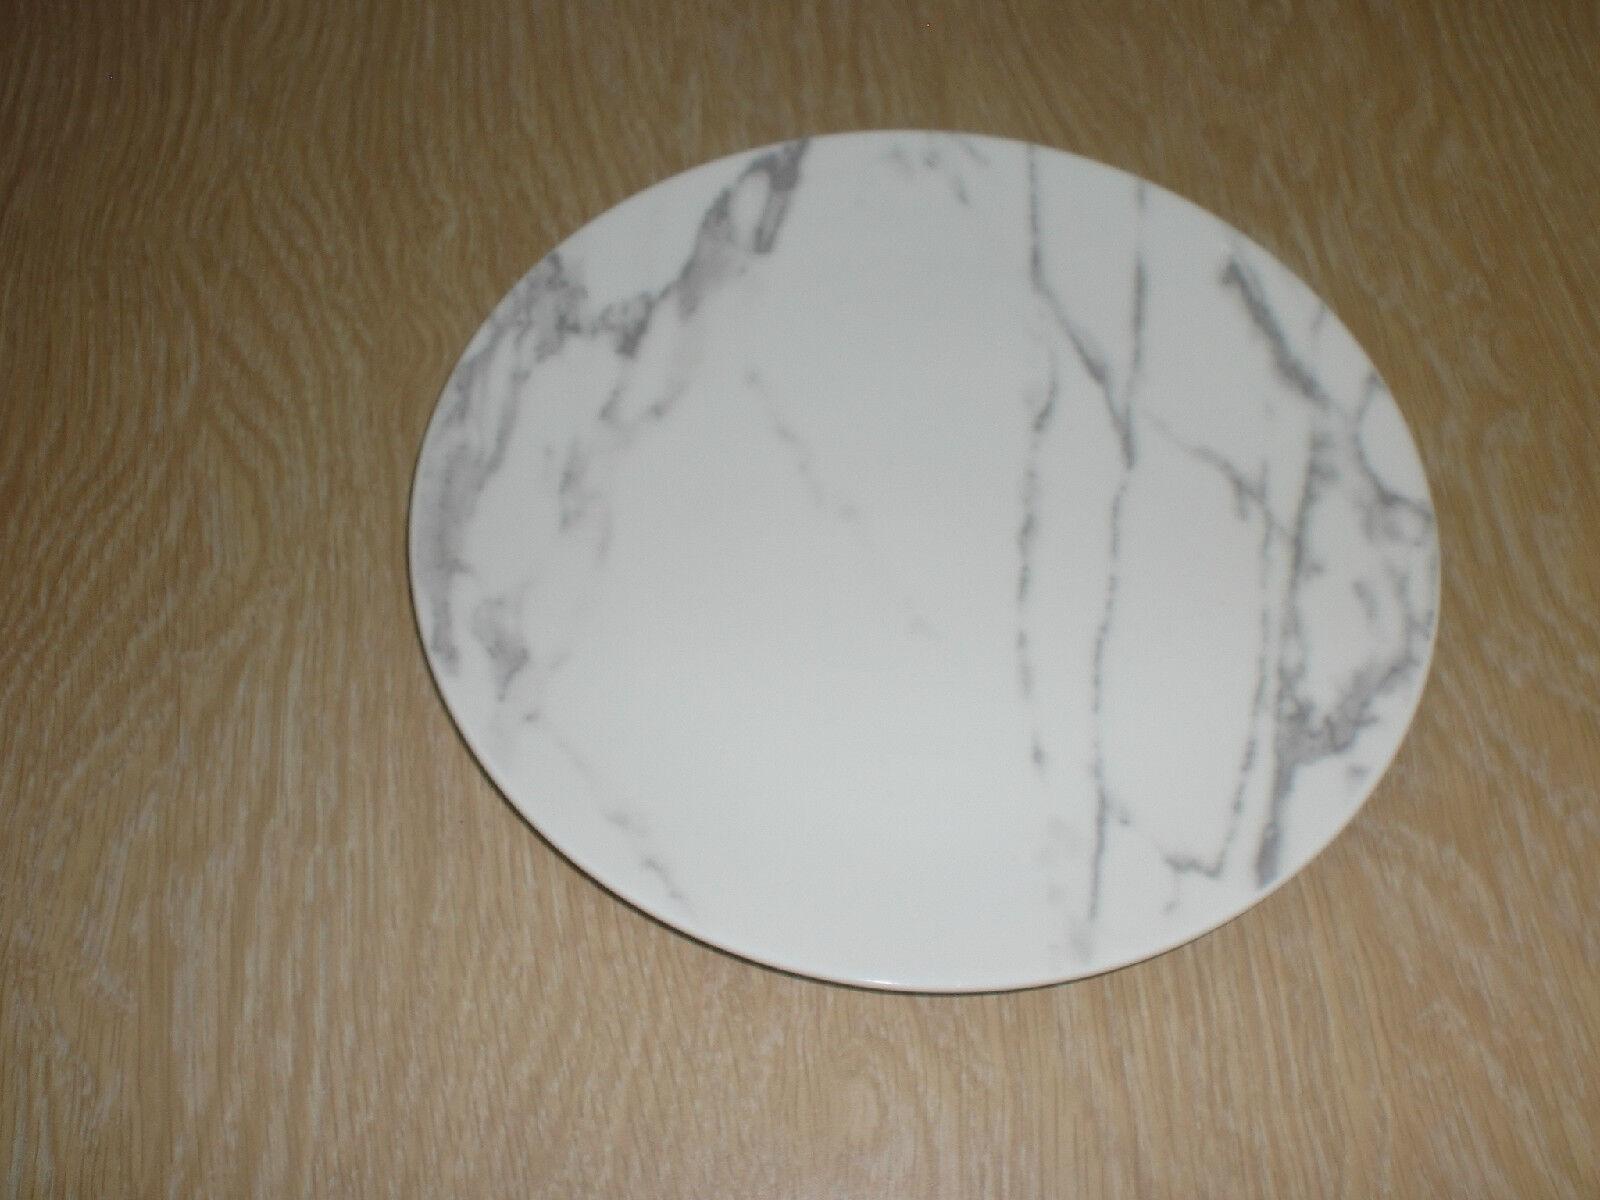 Dibbern Carrara  Teller flach 21 cm     Umweltfreundlich